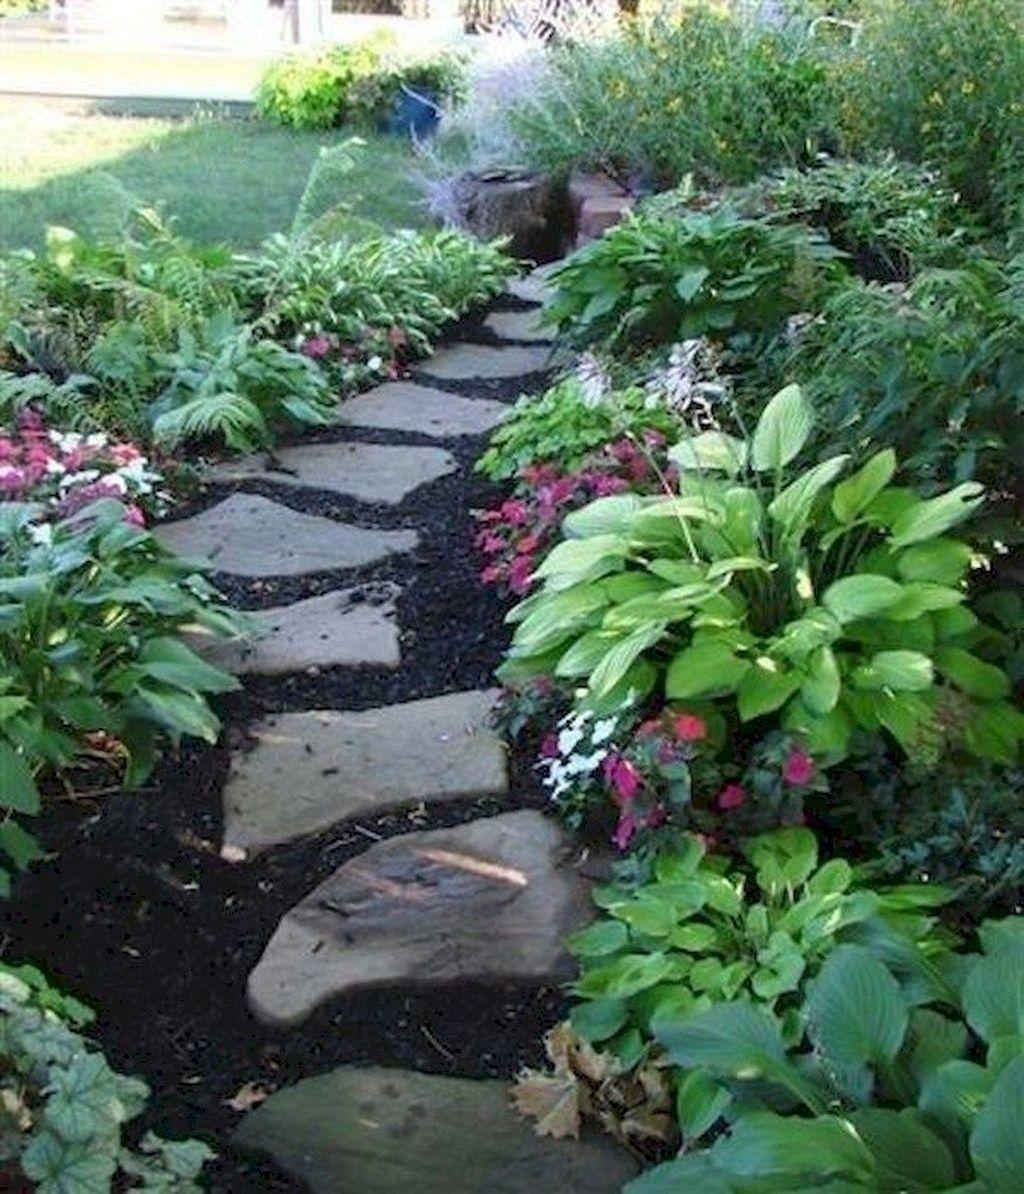 Creative Rock Garden Landscaping Ideas On a Budget 29